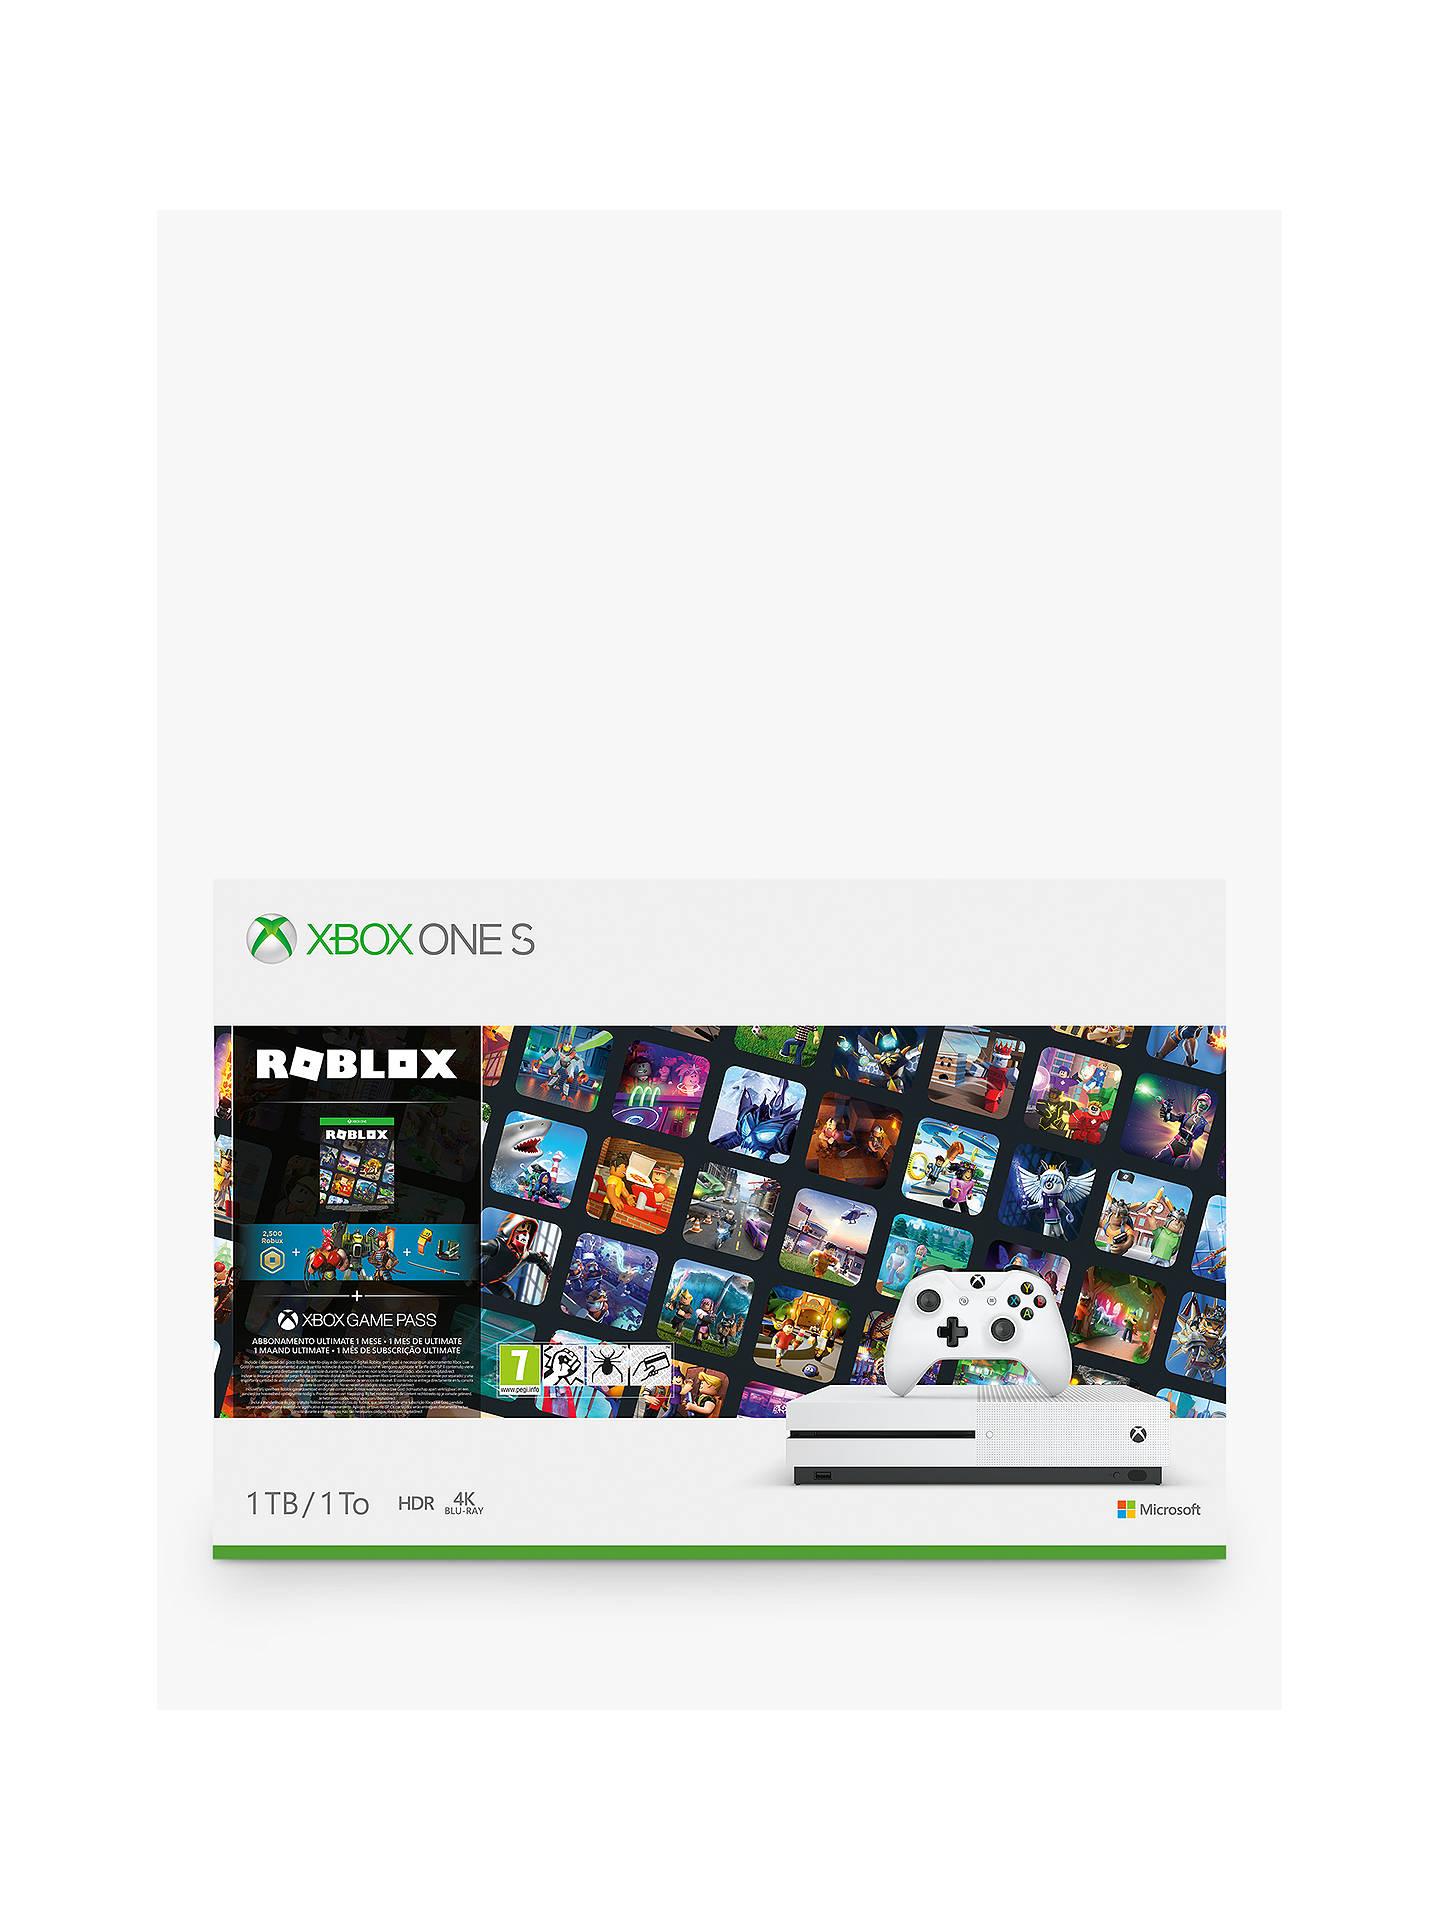 Xbox One S Roblox Bundle Code